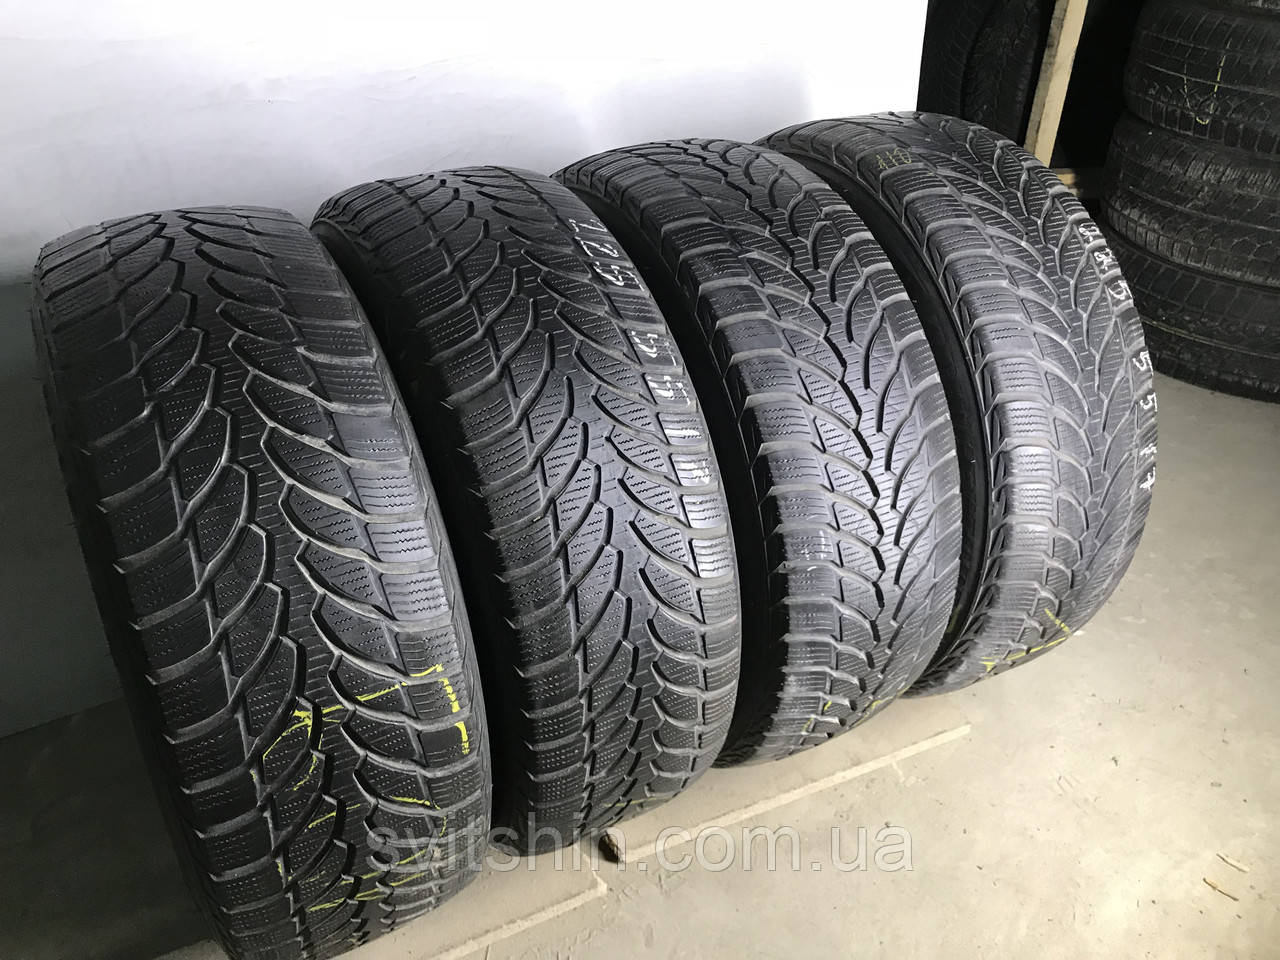 Шины бу зима 225/55R17 Bridgestone Blizzak LM-32 (RFT) 4,5-5,5мм